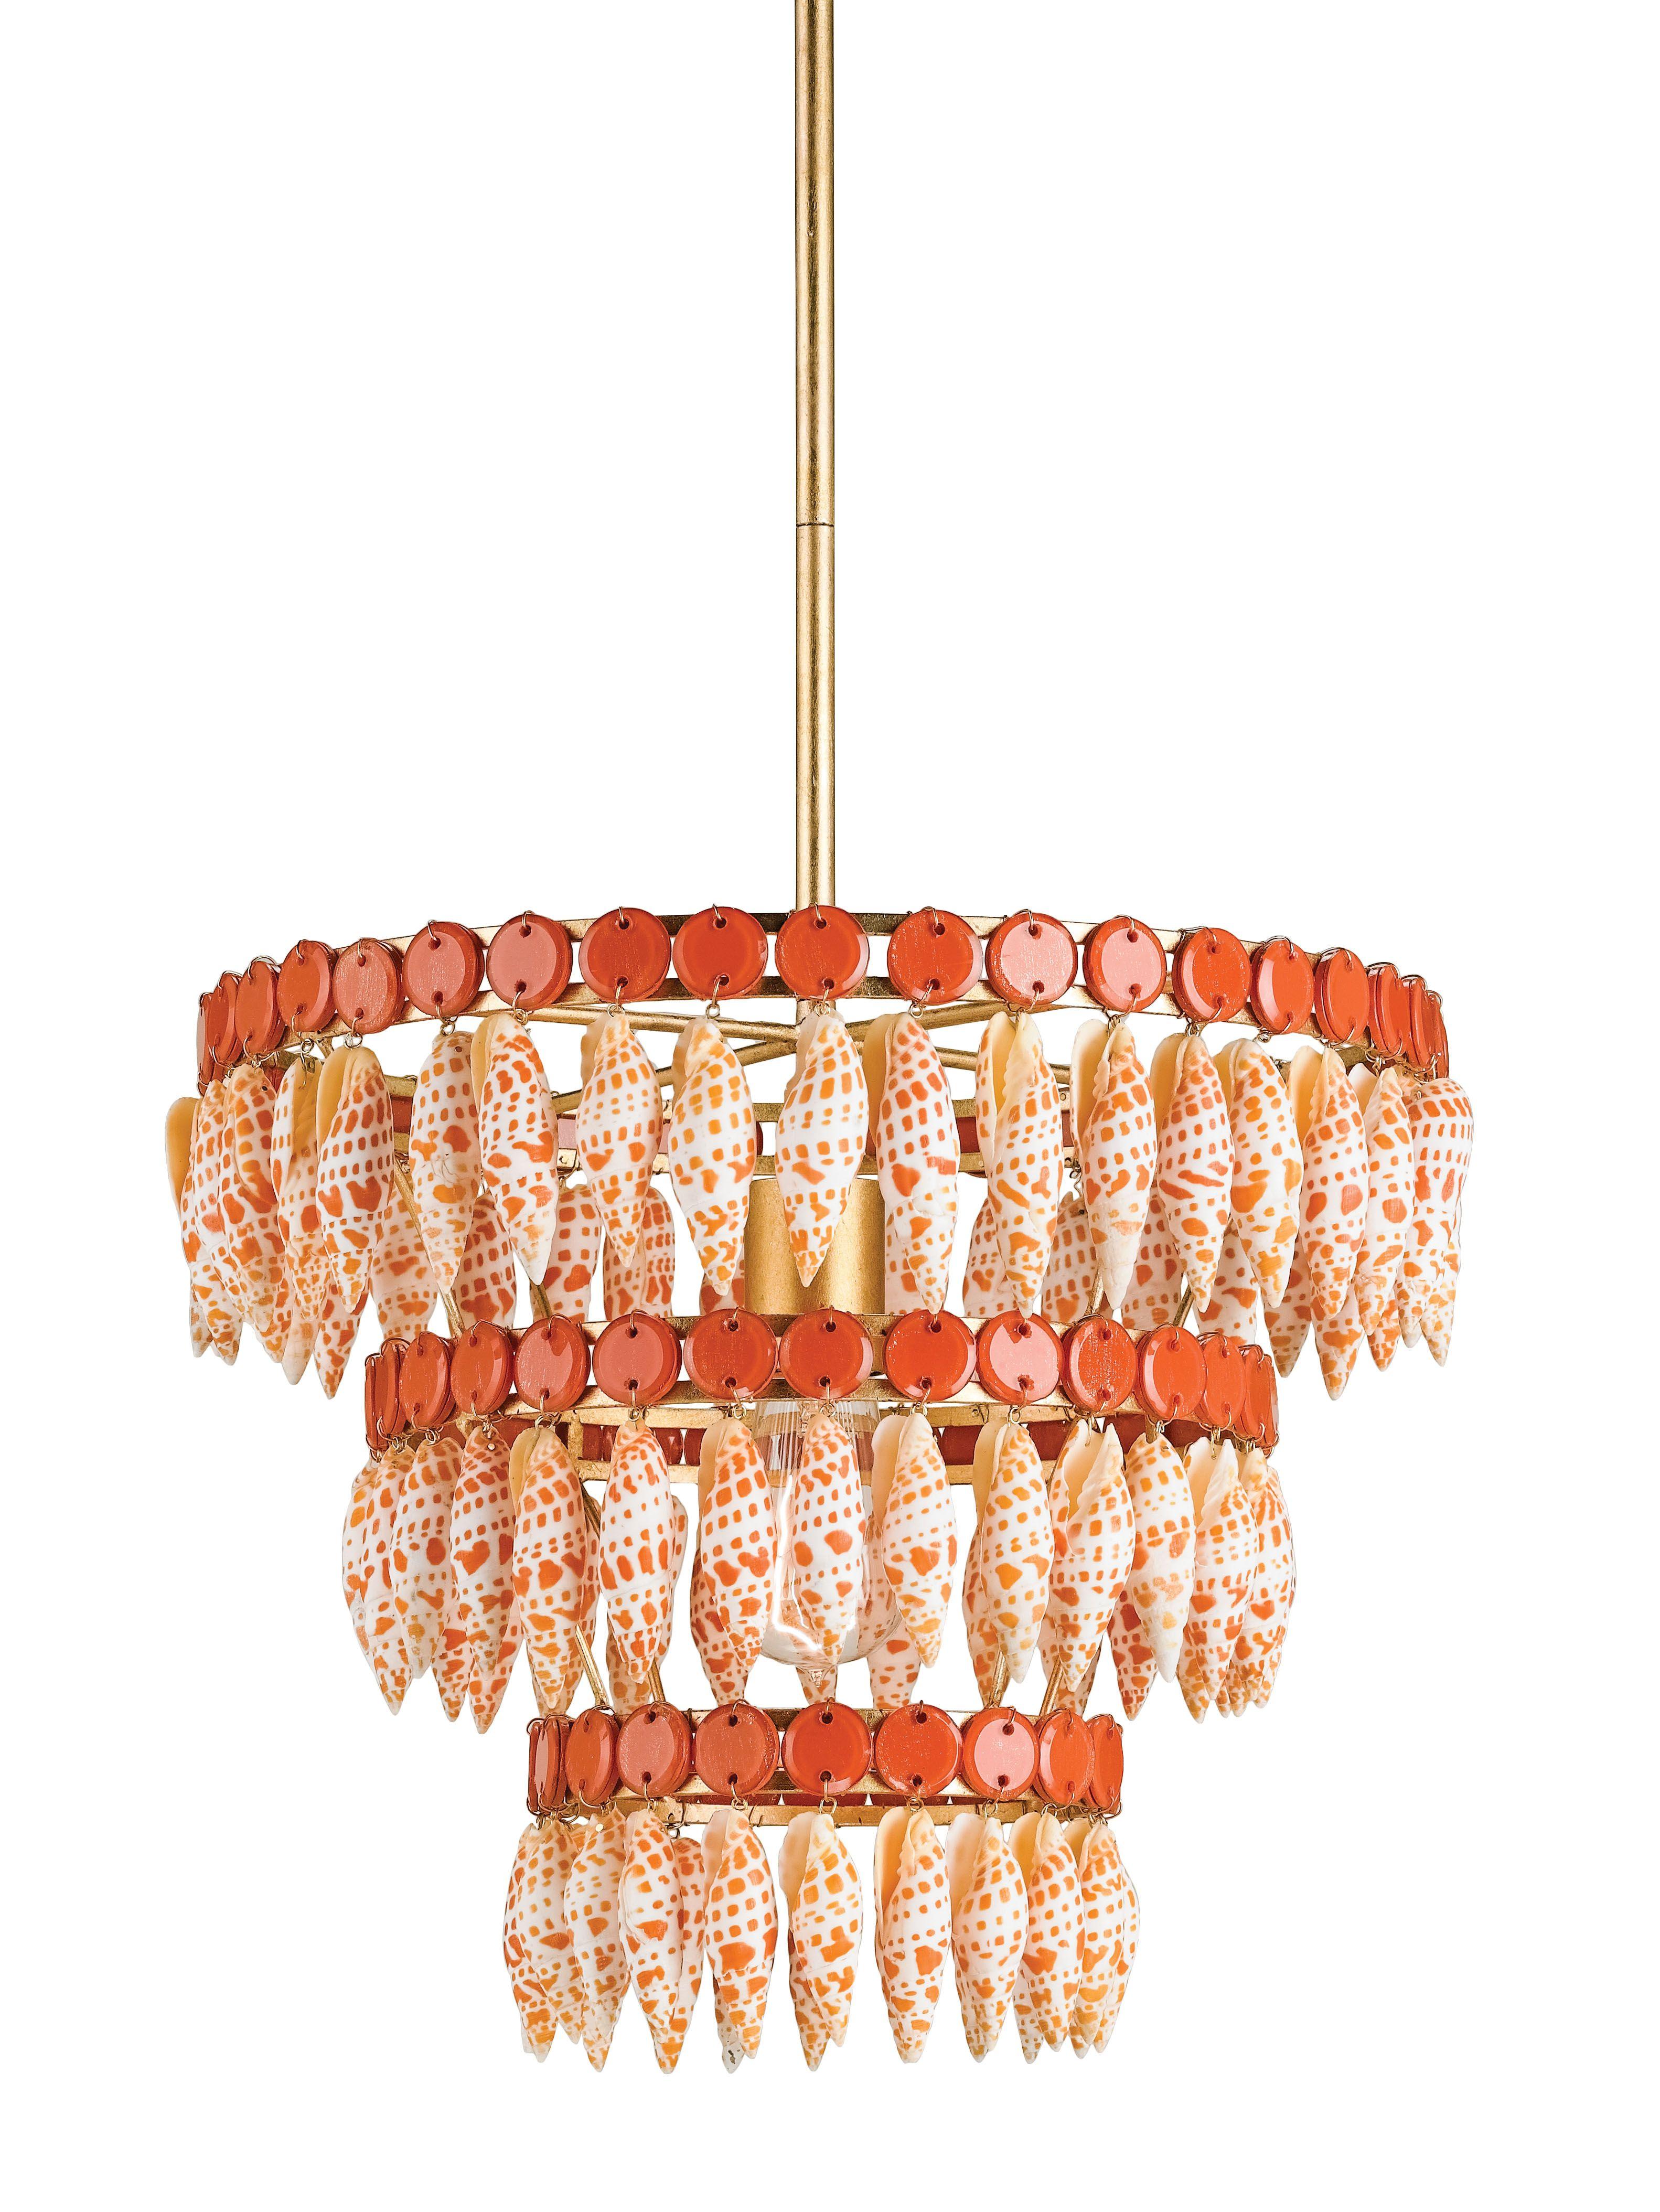 chandelier garden krystal overstock product orange home today shipping free